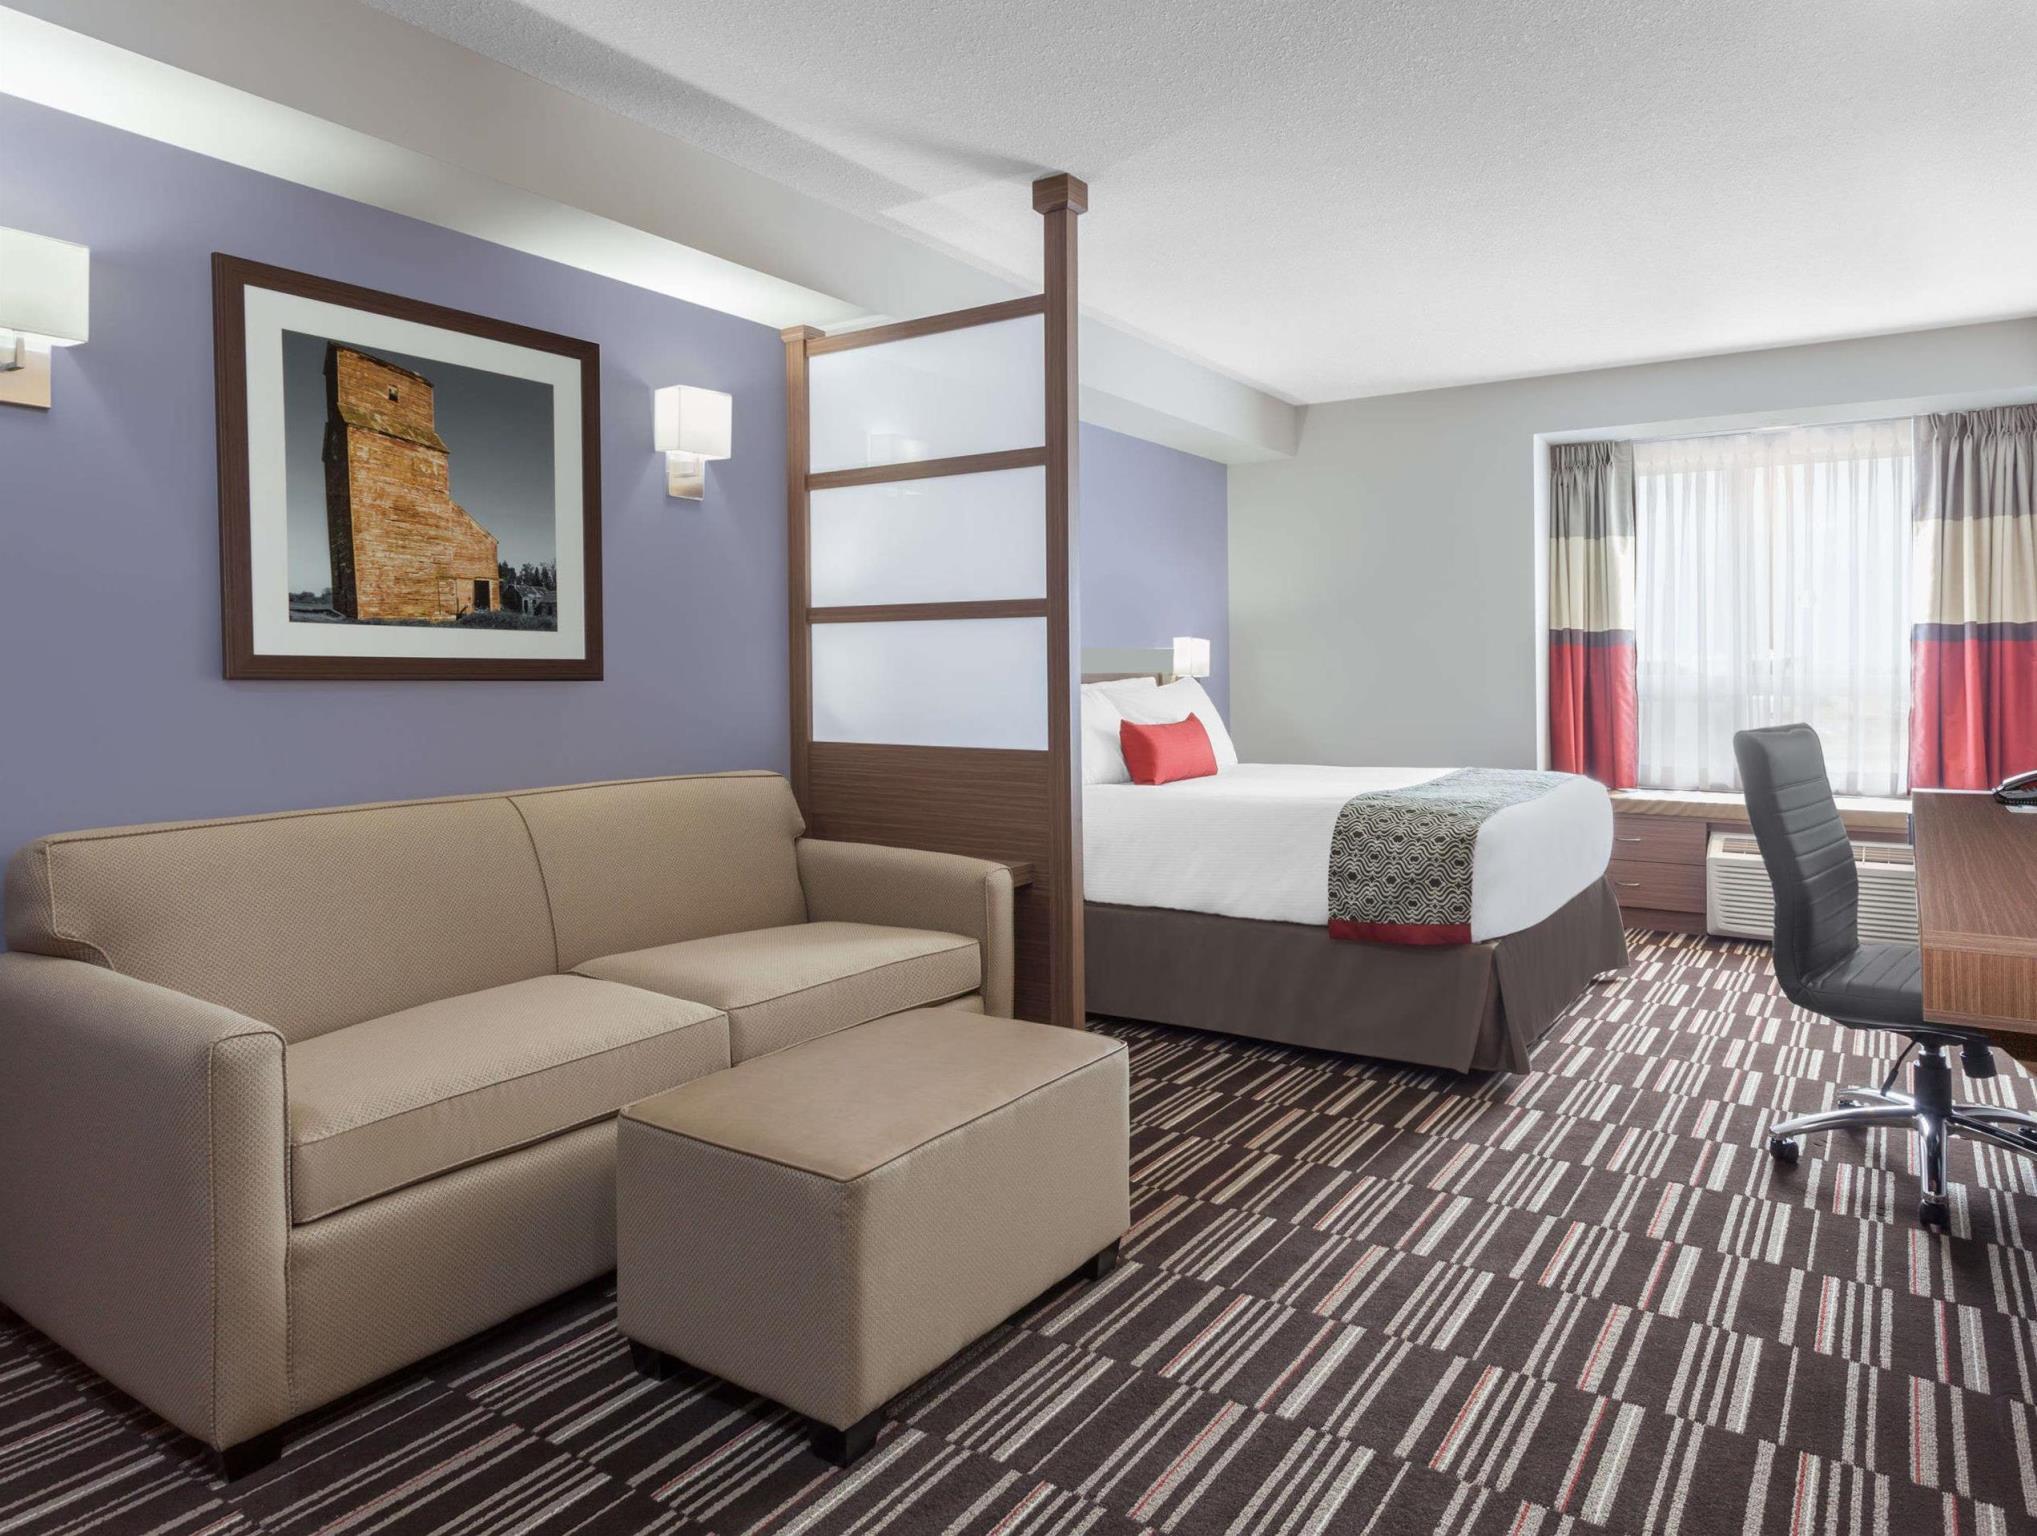 Microtel Inn & Suites By Wyndham Bonnyville